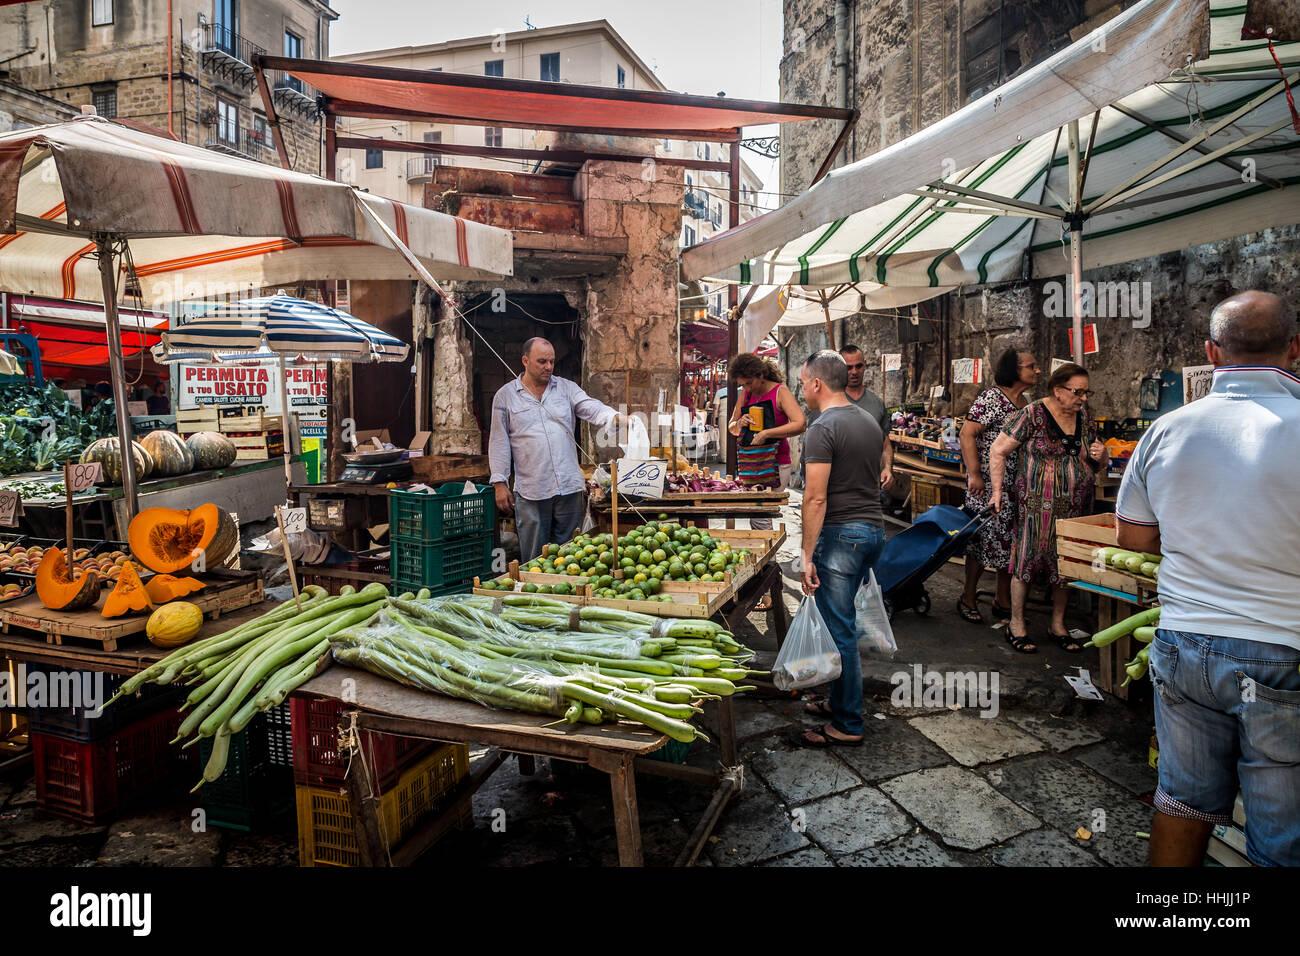 Gemüse Stall in sizilianisches Marktes, Palermo, Sizilien Stockfoto